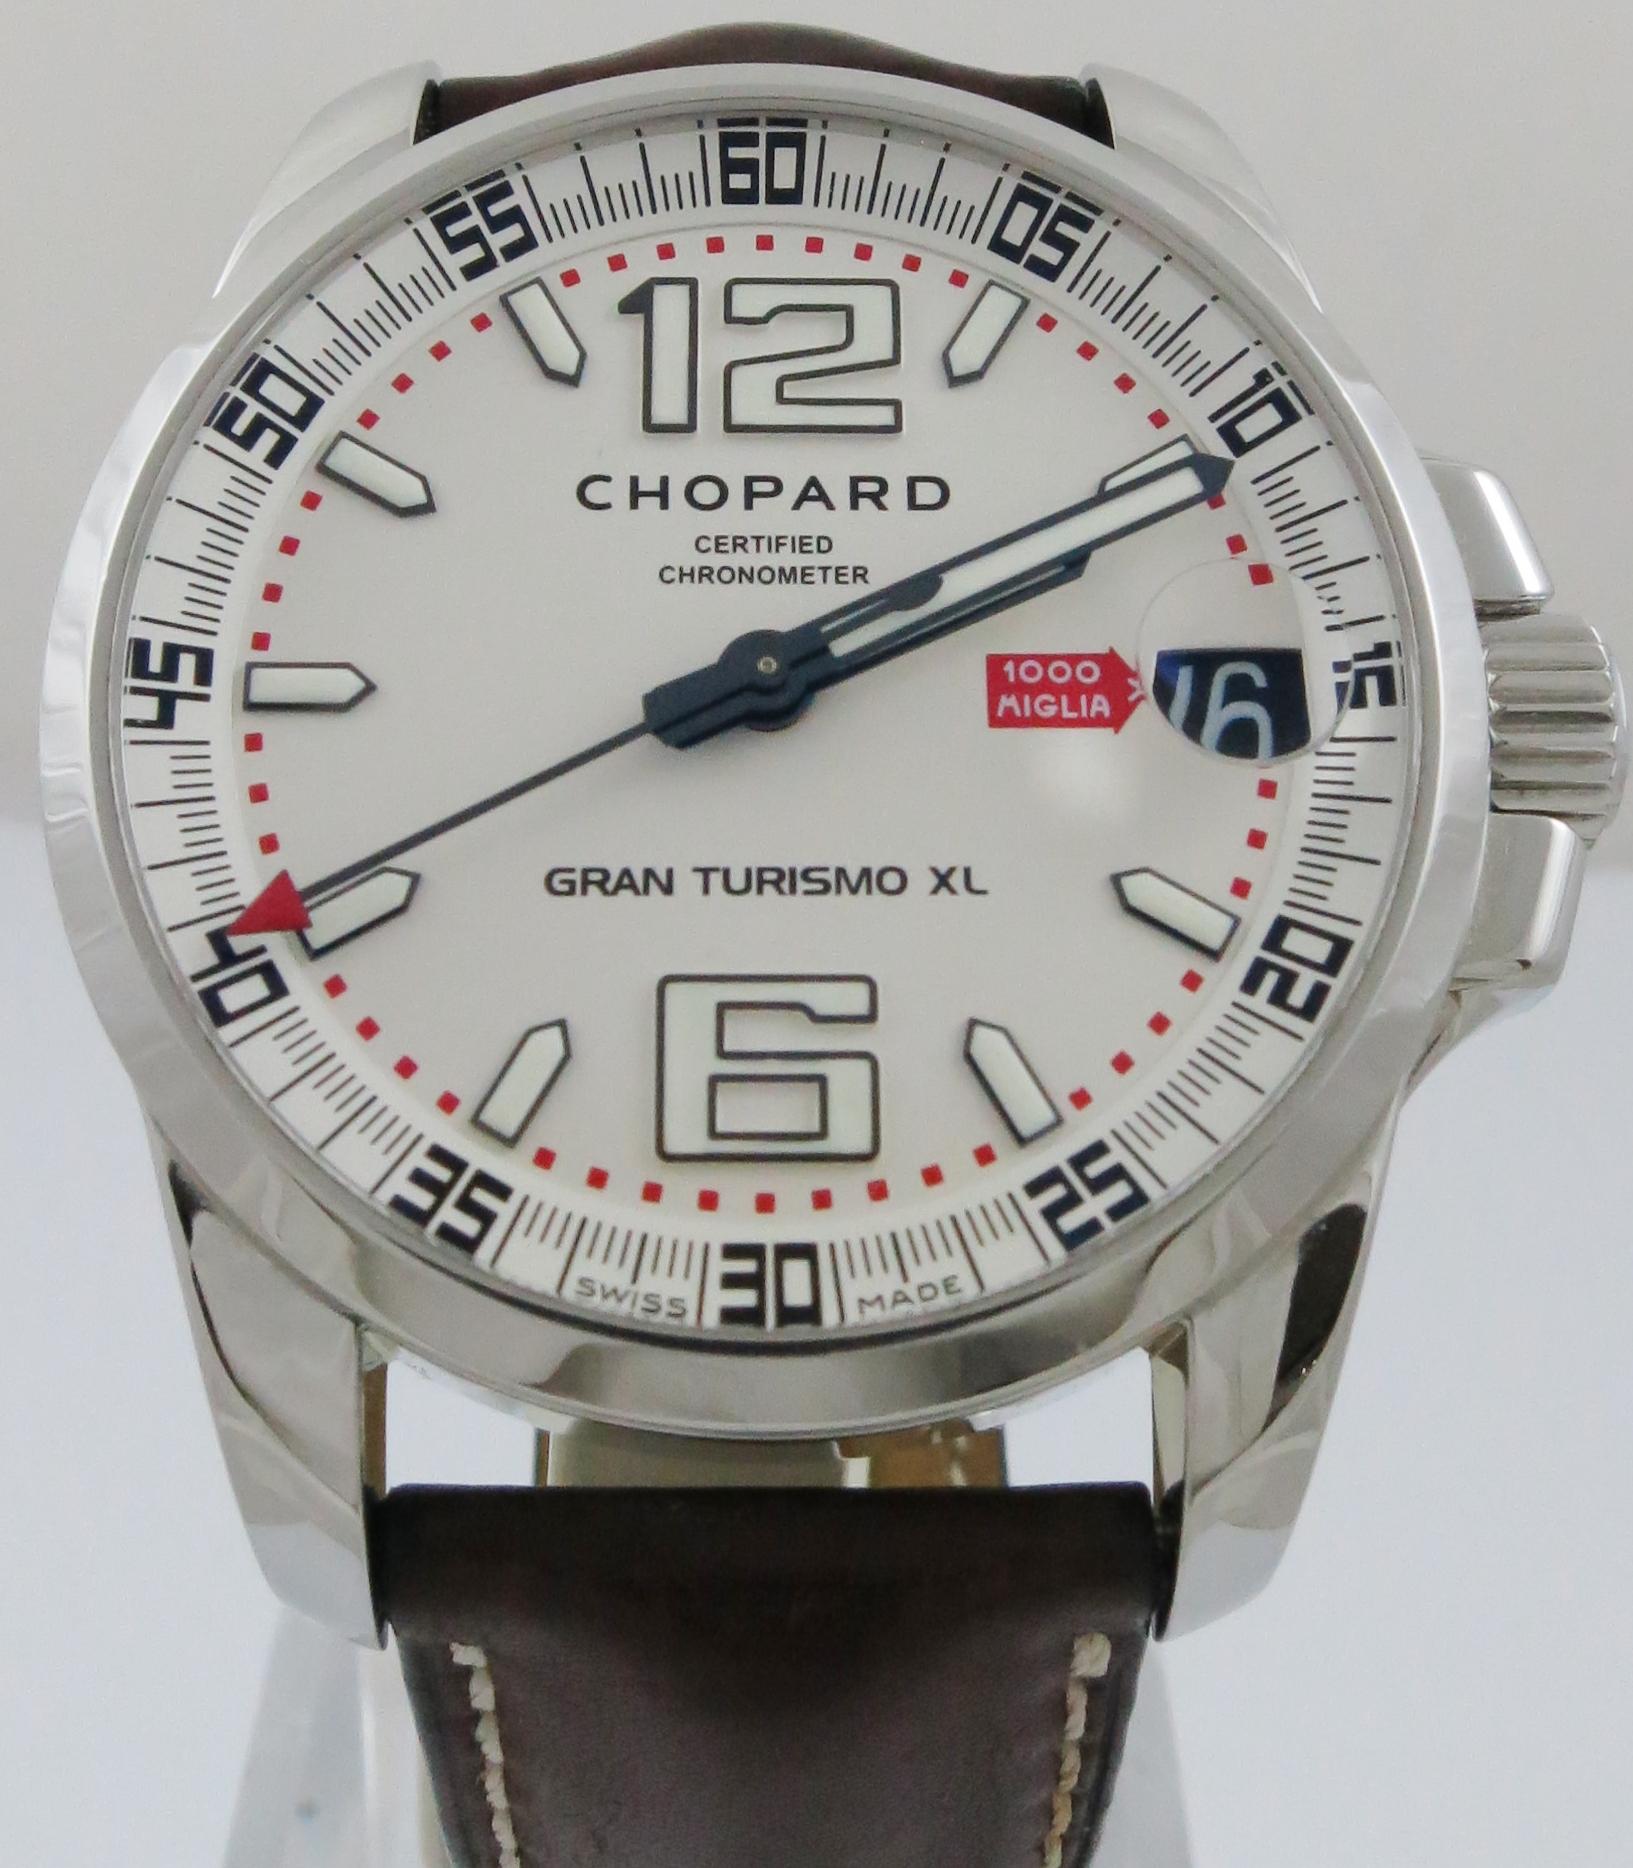 CHOPARD GRAN TURISMO XL